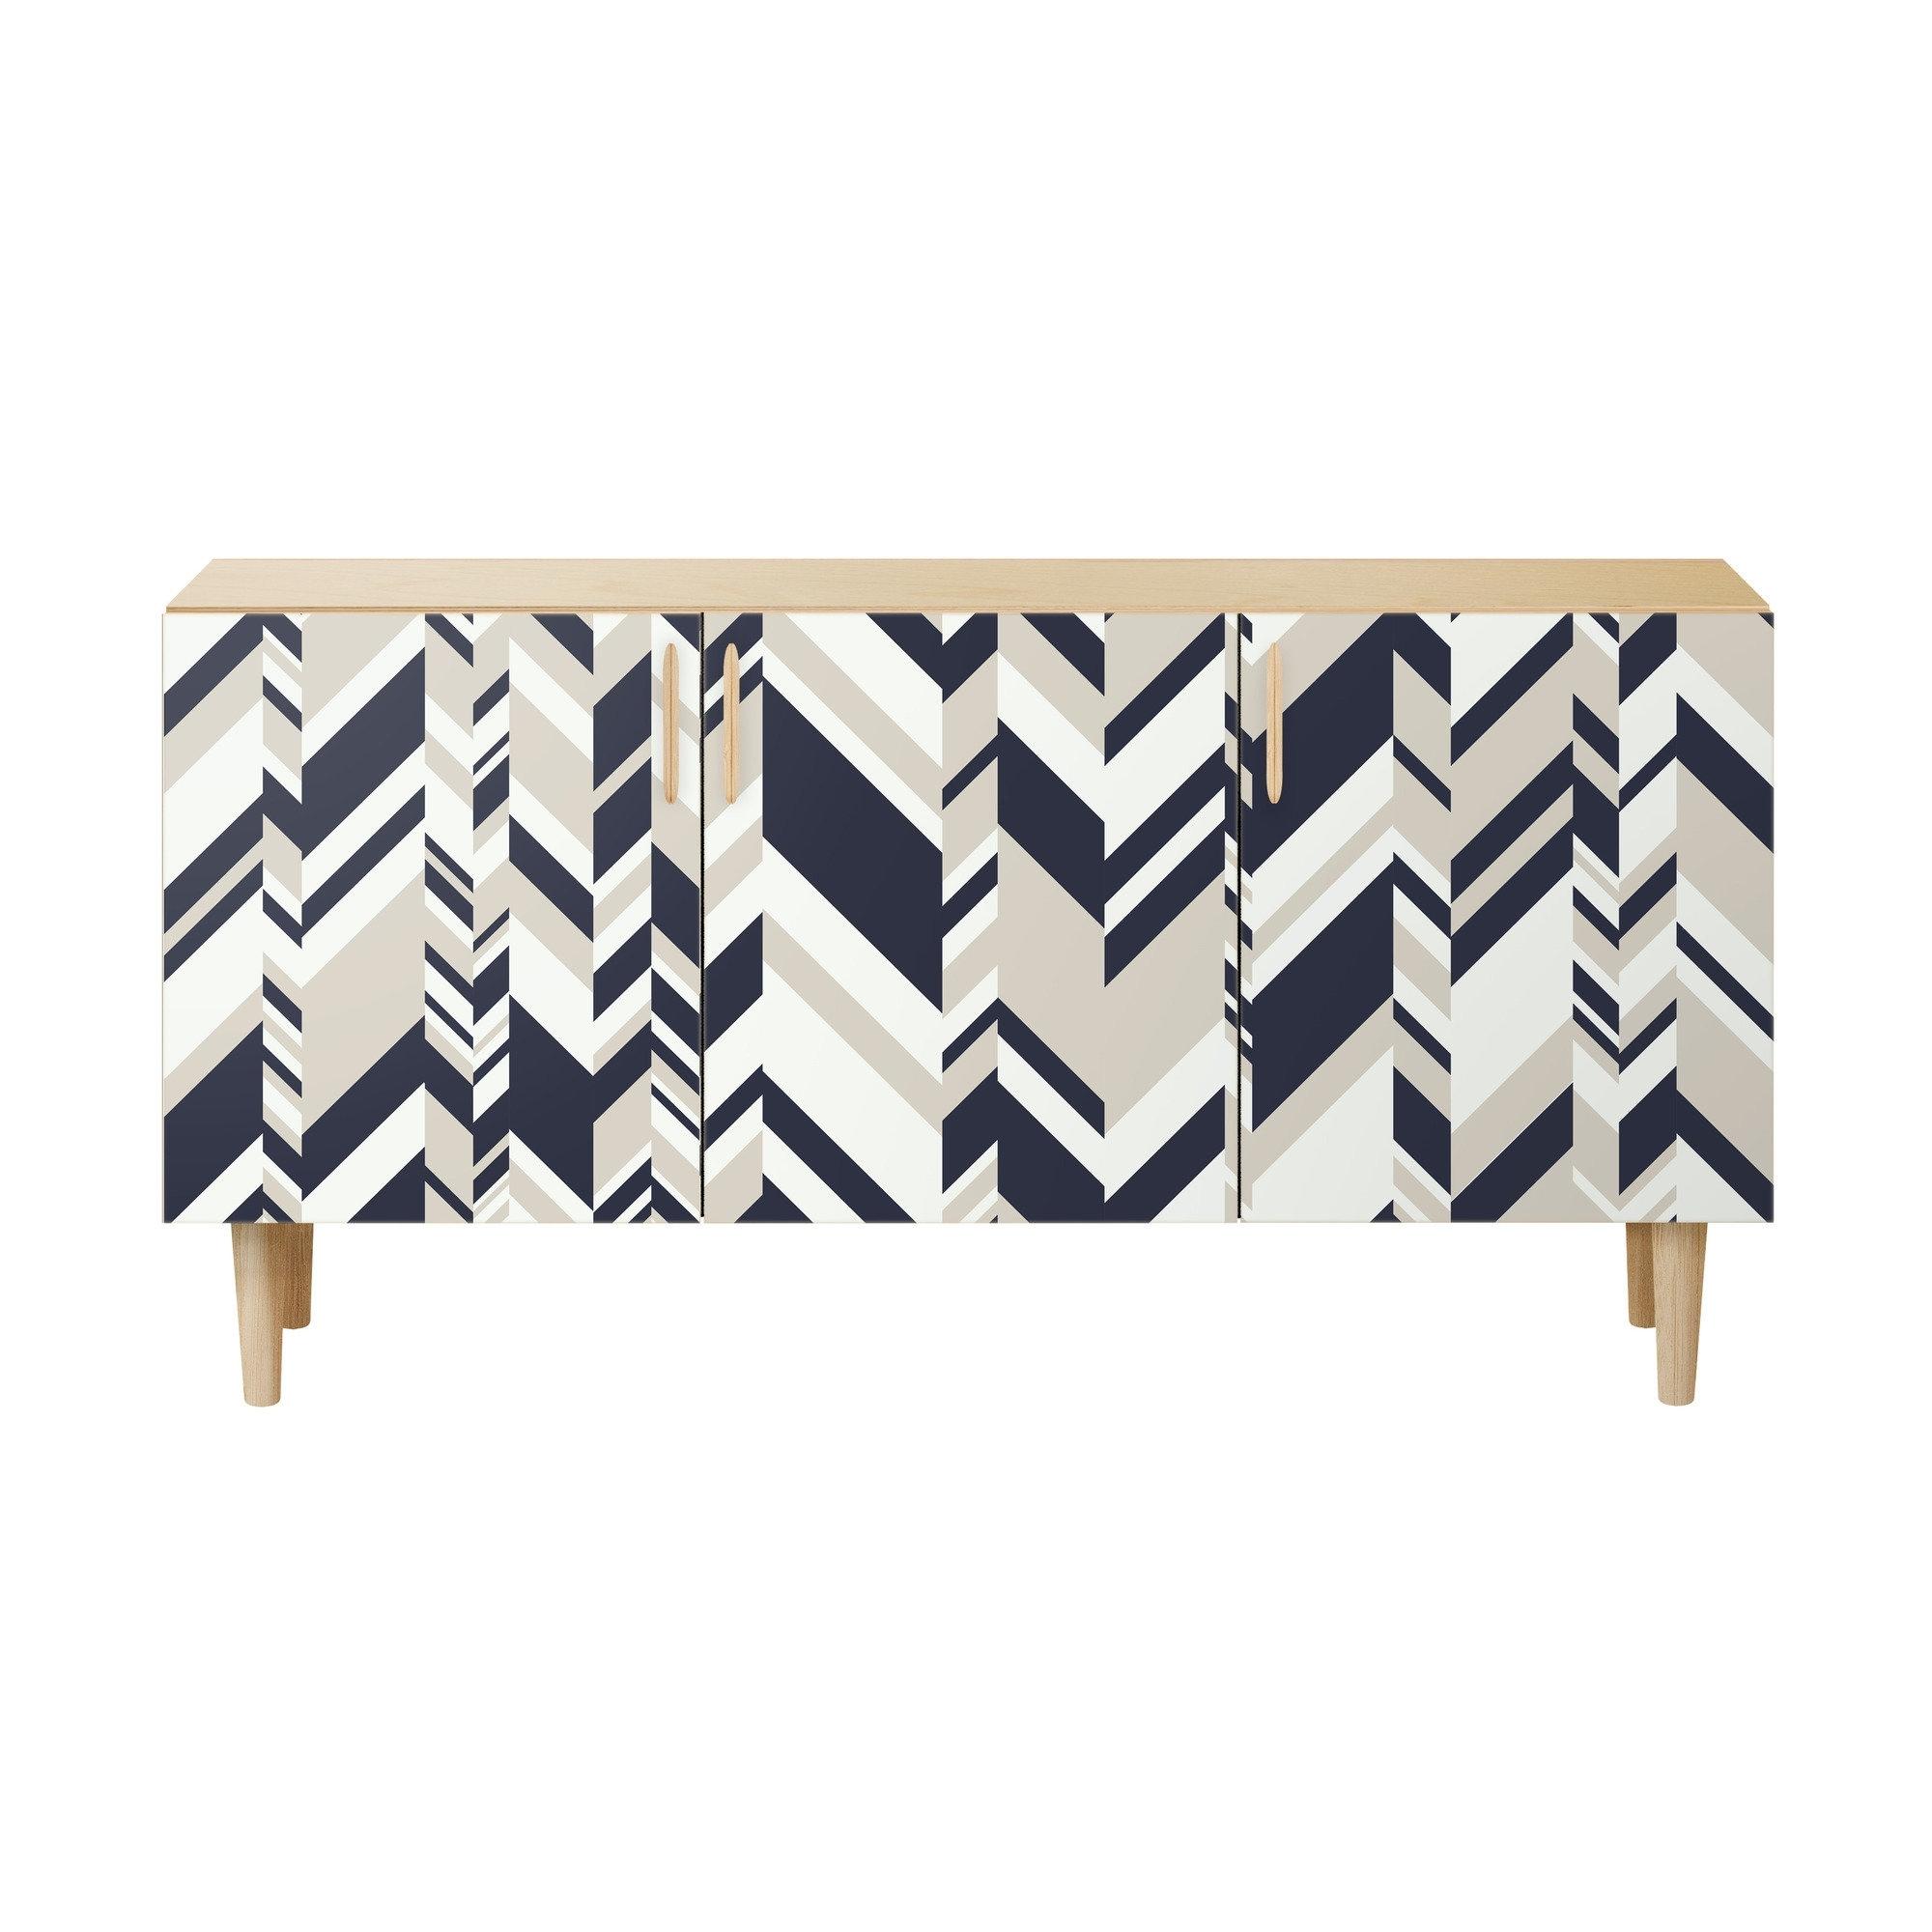 Orren Ellis Nadell Sideboard | Wayfair intended for Teagan Sideboards (Image 21 of 30)